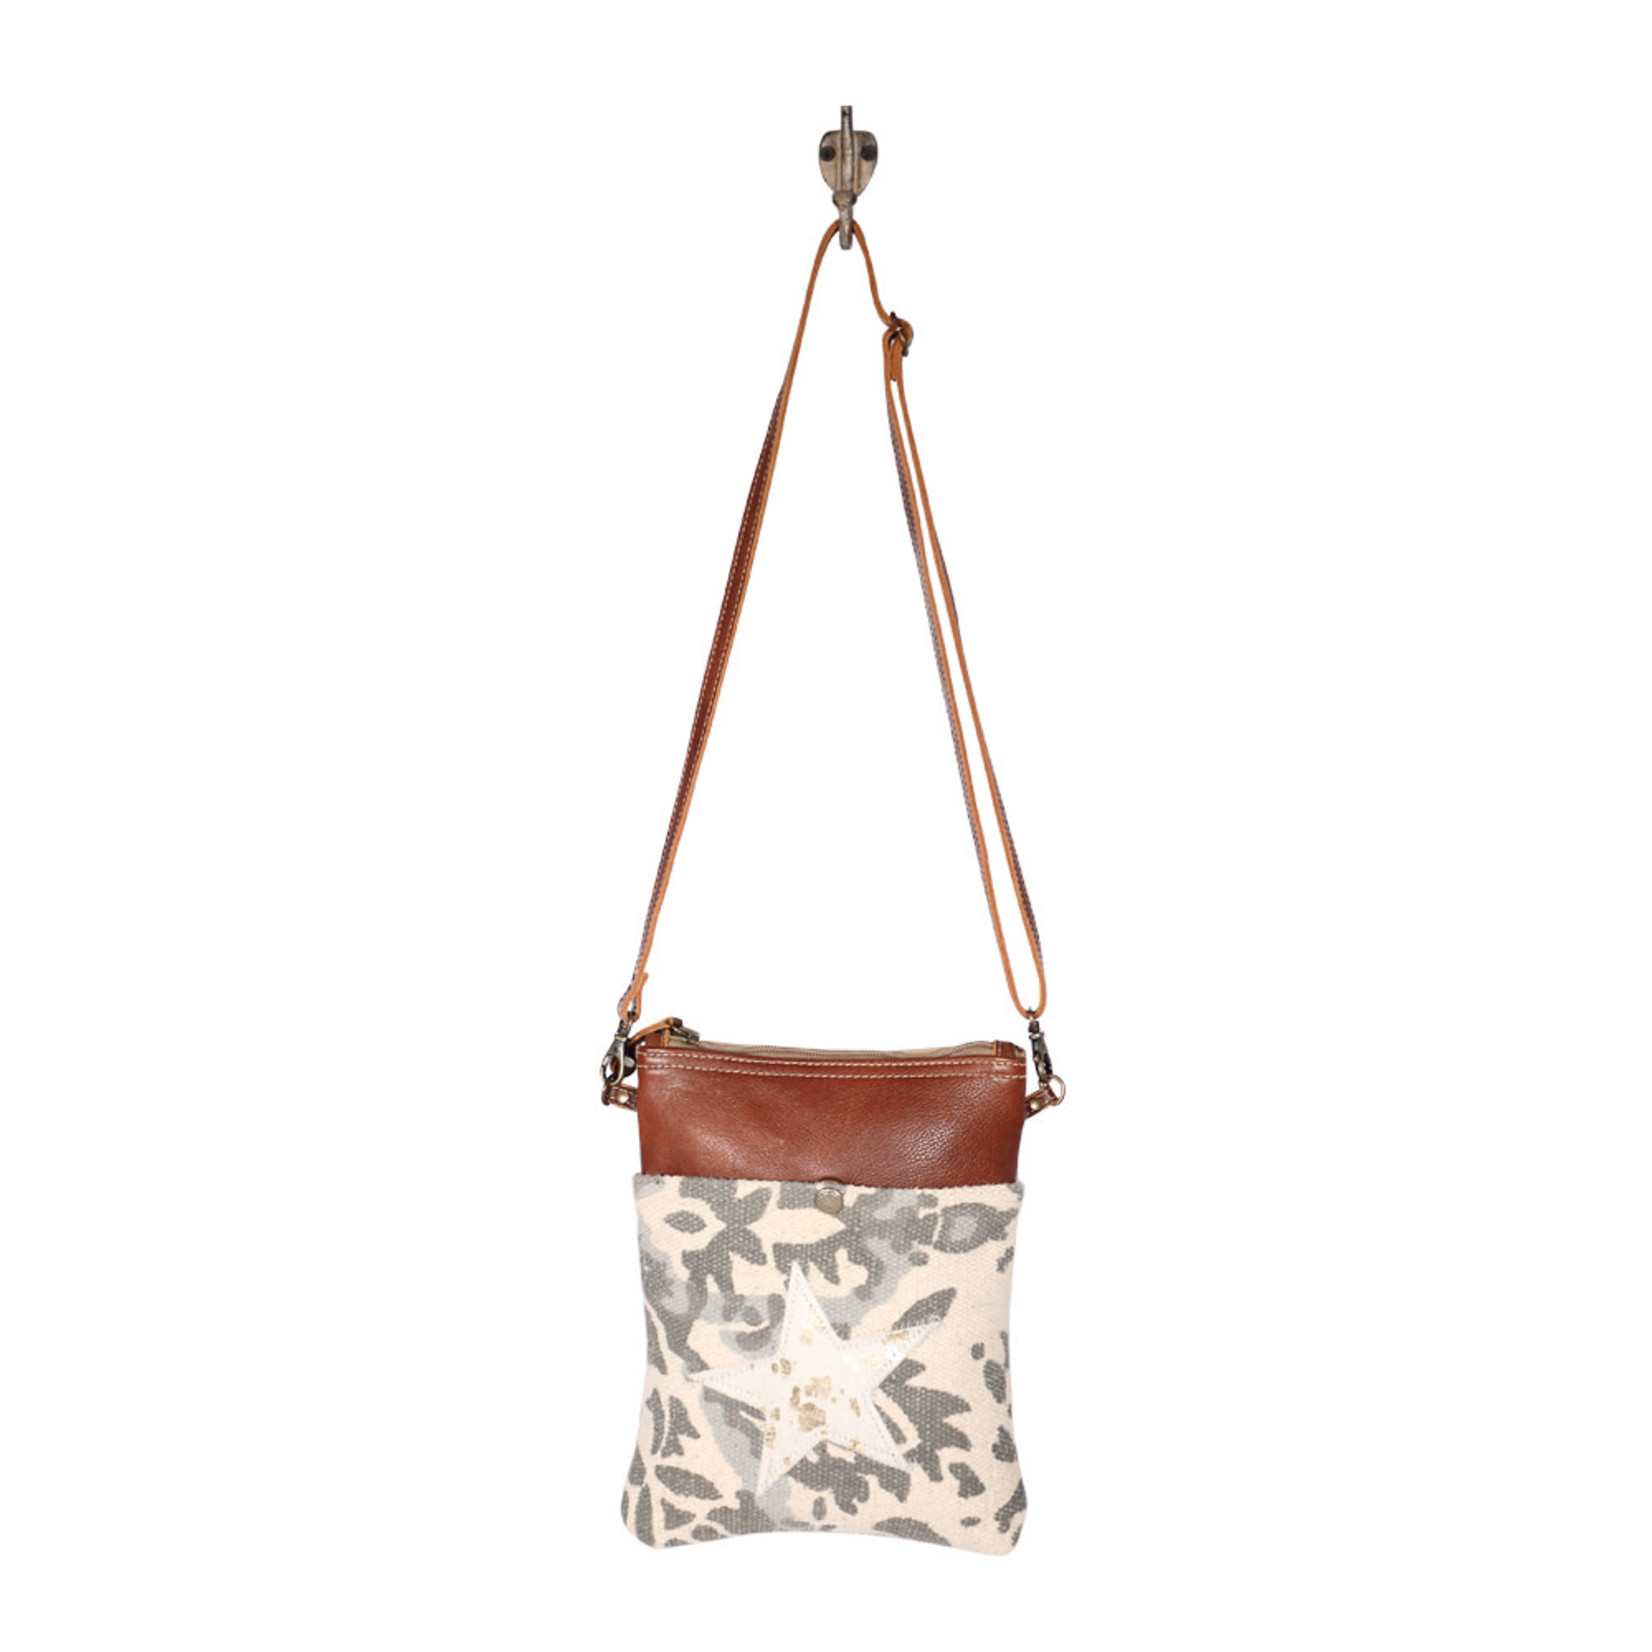 Myra Bags S-1920 Gorgeous Small & Crossbody Bag